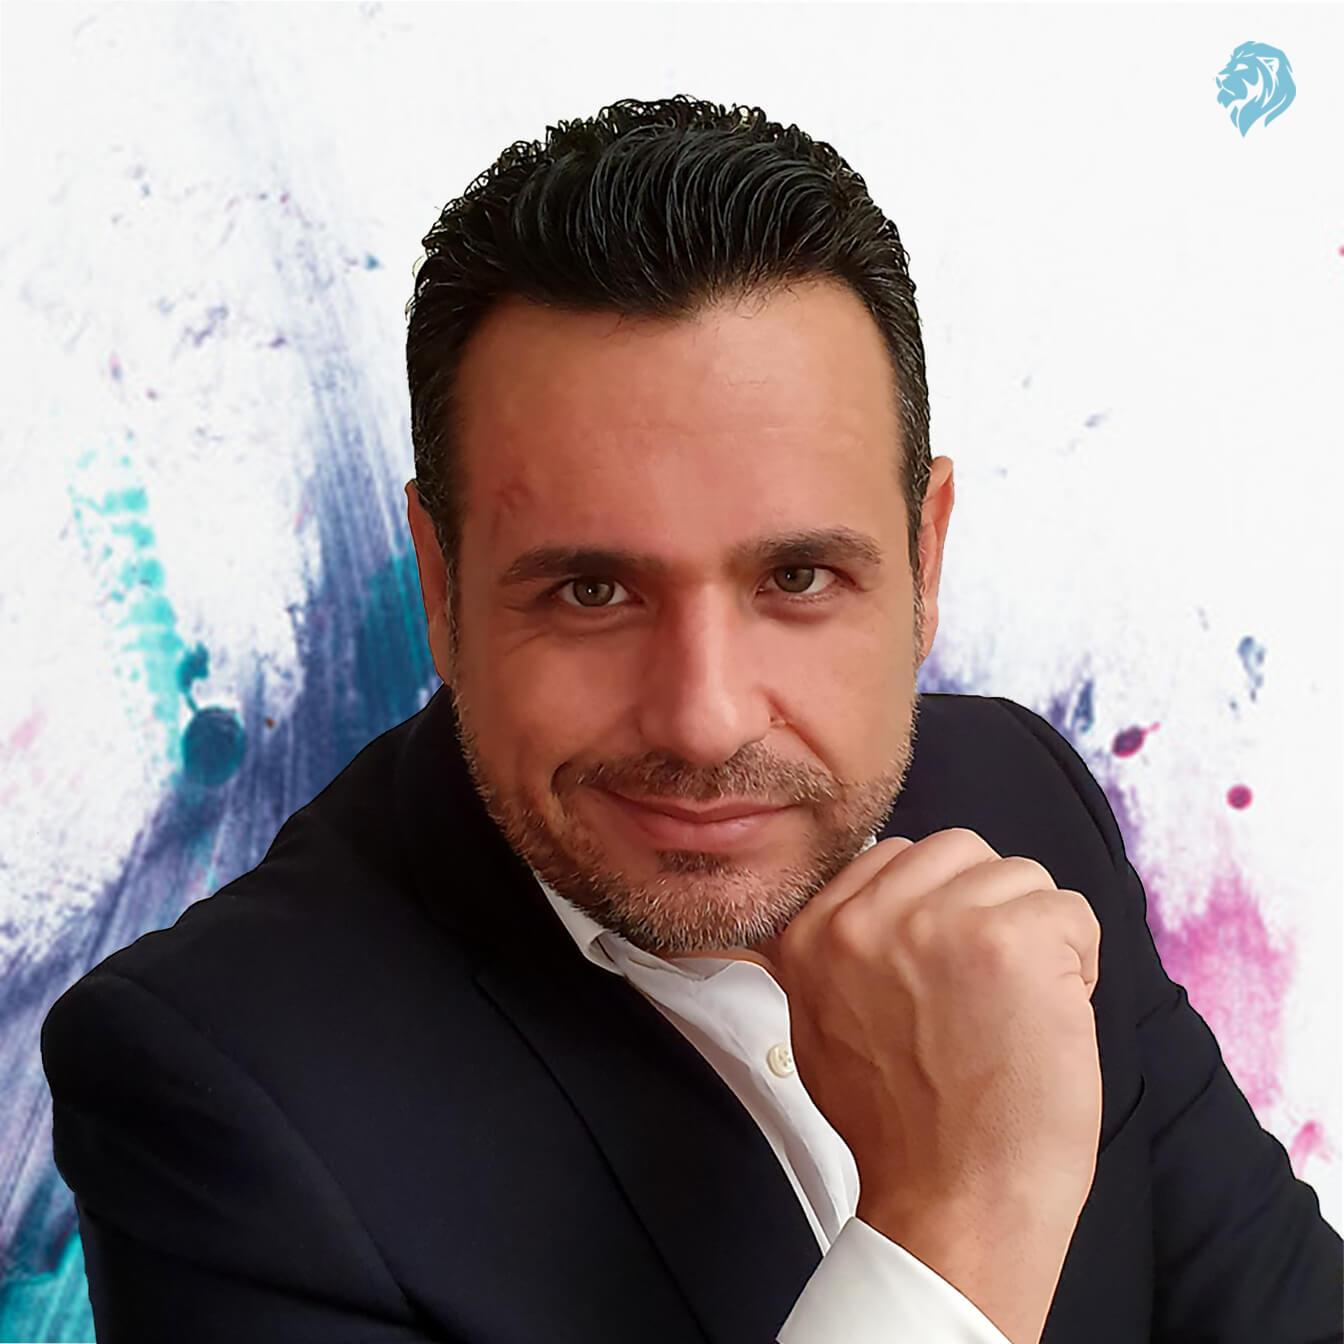 Jose Manuel socio de Prouvé 1